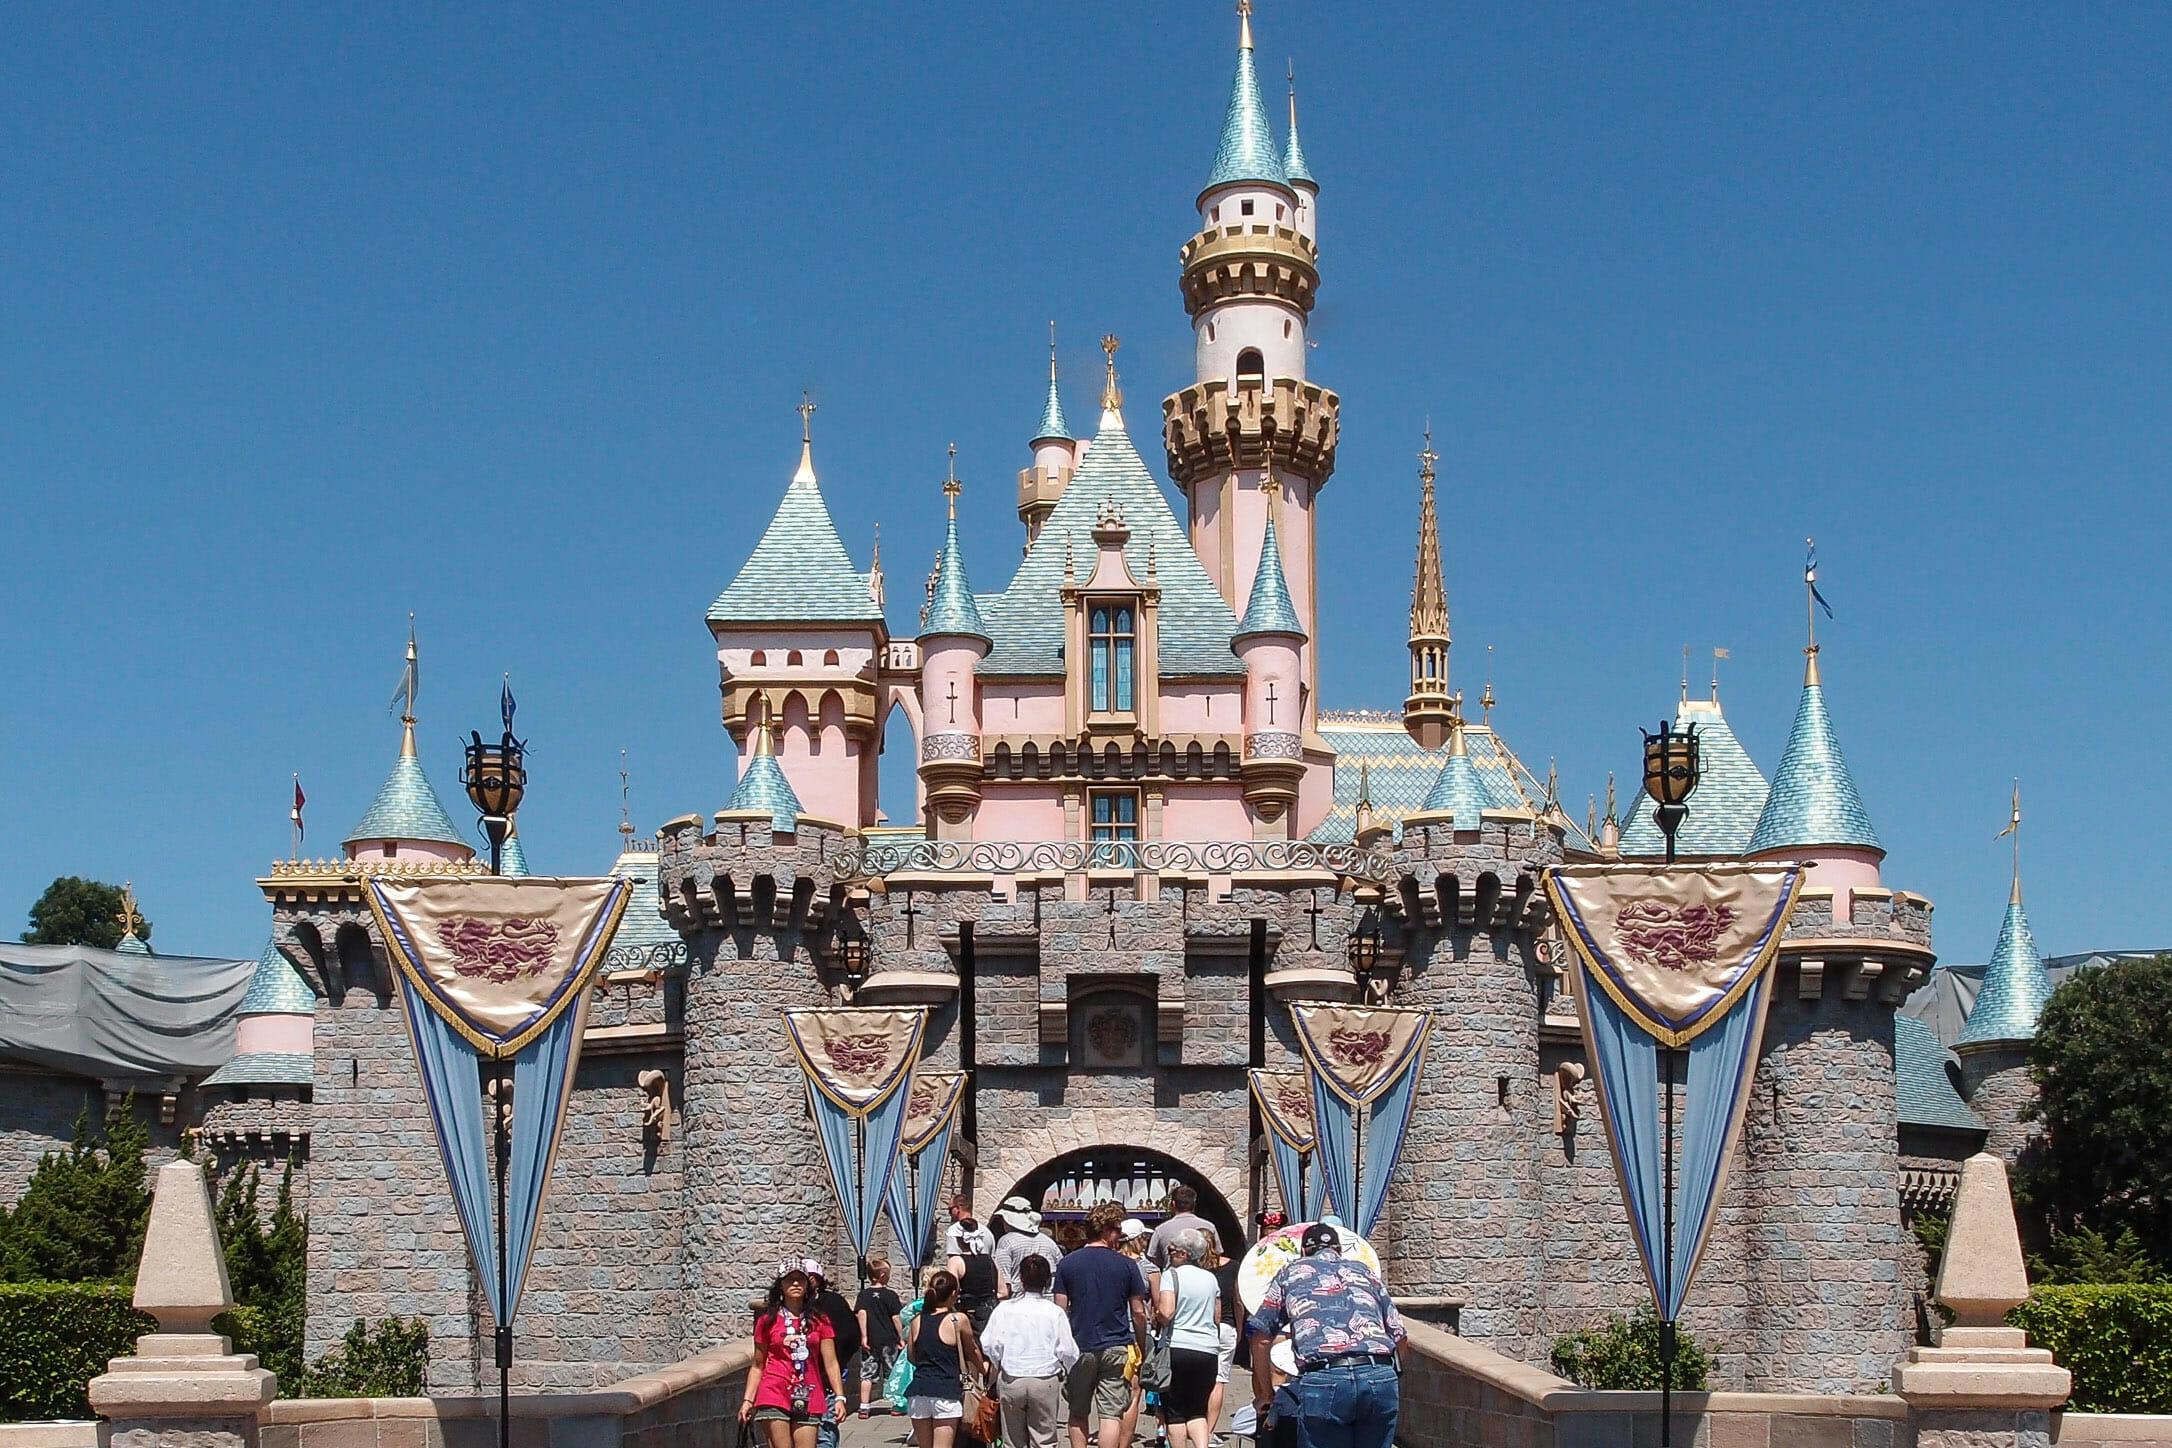 Disneyland California USA Princess Castle Pink Tower Blue Turret tourist destination